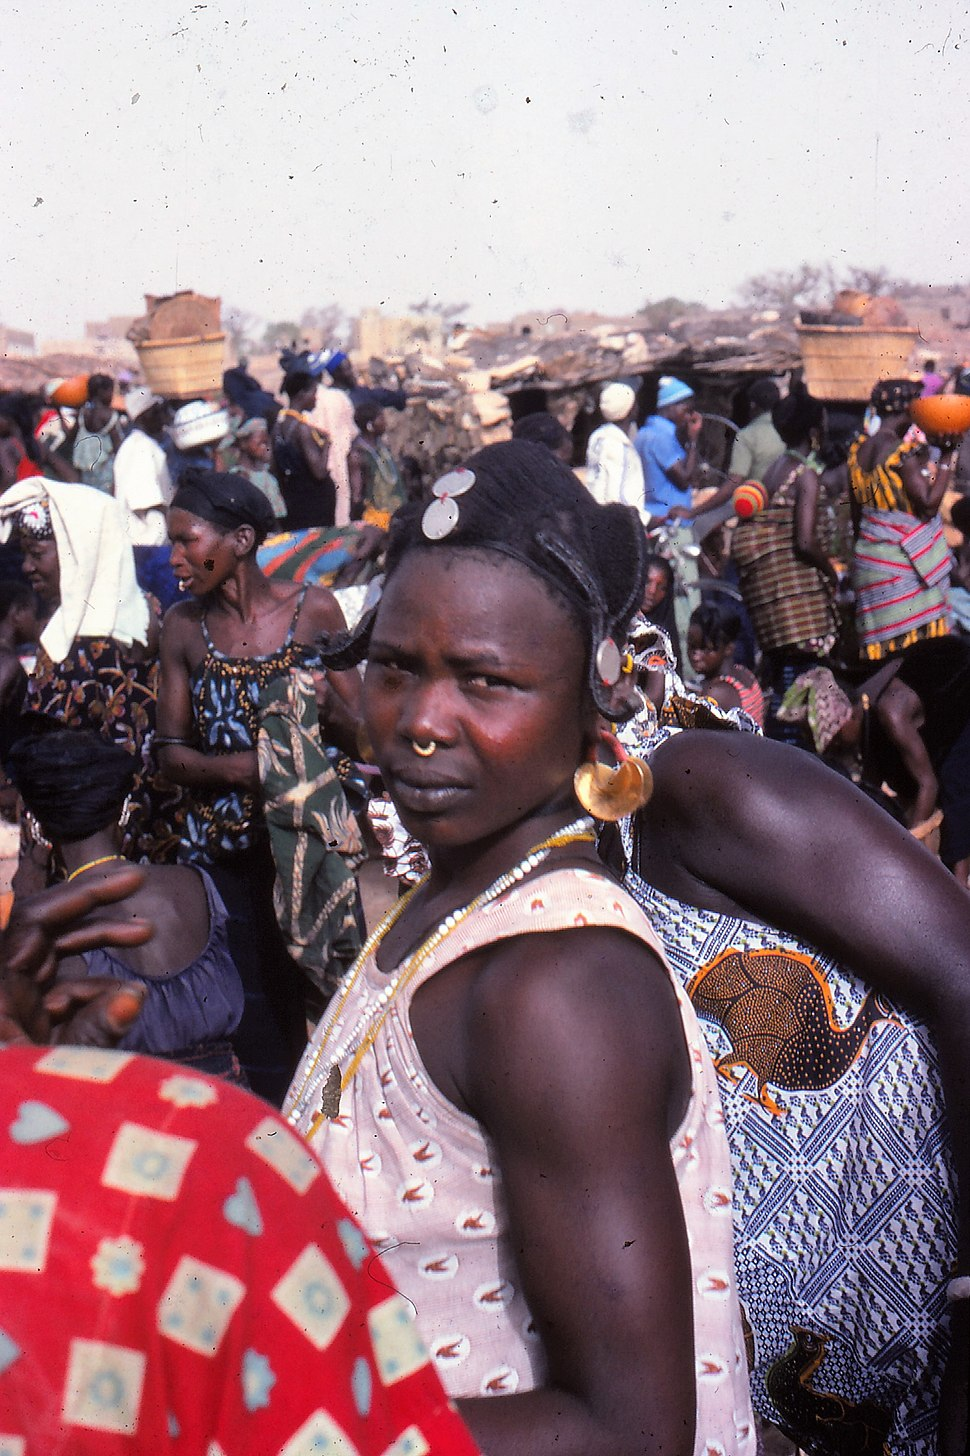 ASC Leiden - W.E.A. van Beek Collection - Dogon markets 16 - Fulbe woman at Sangha market, Mali 1992 (cropped)